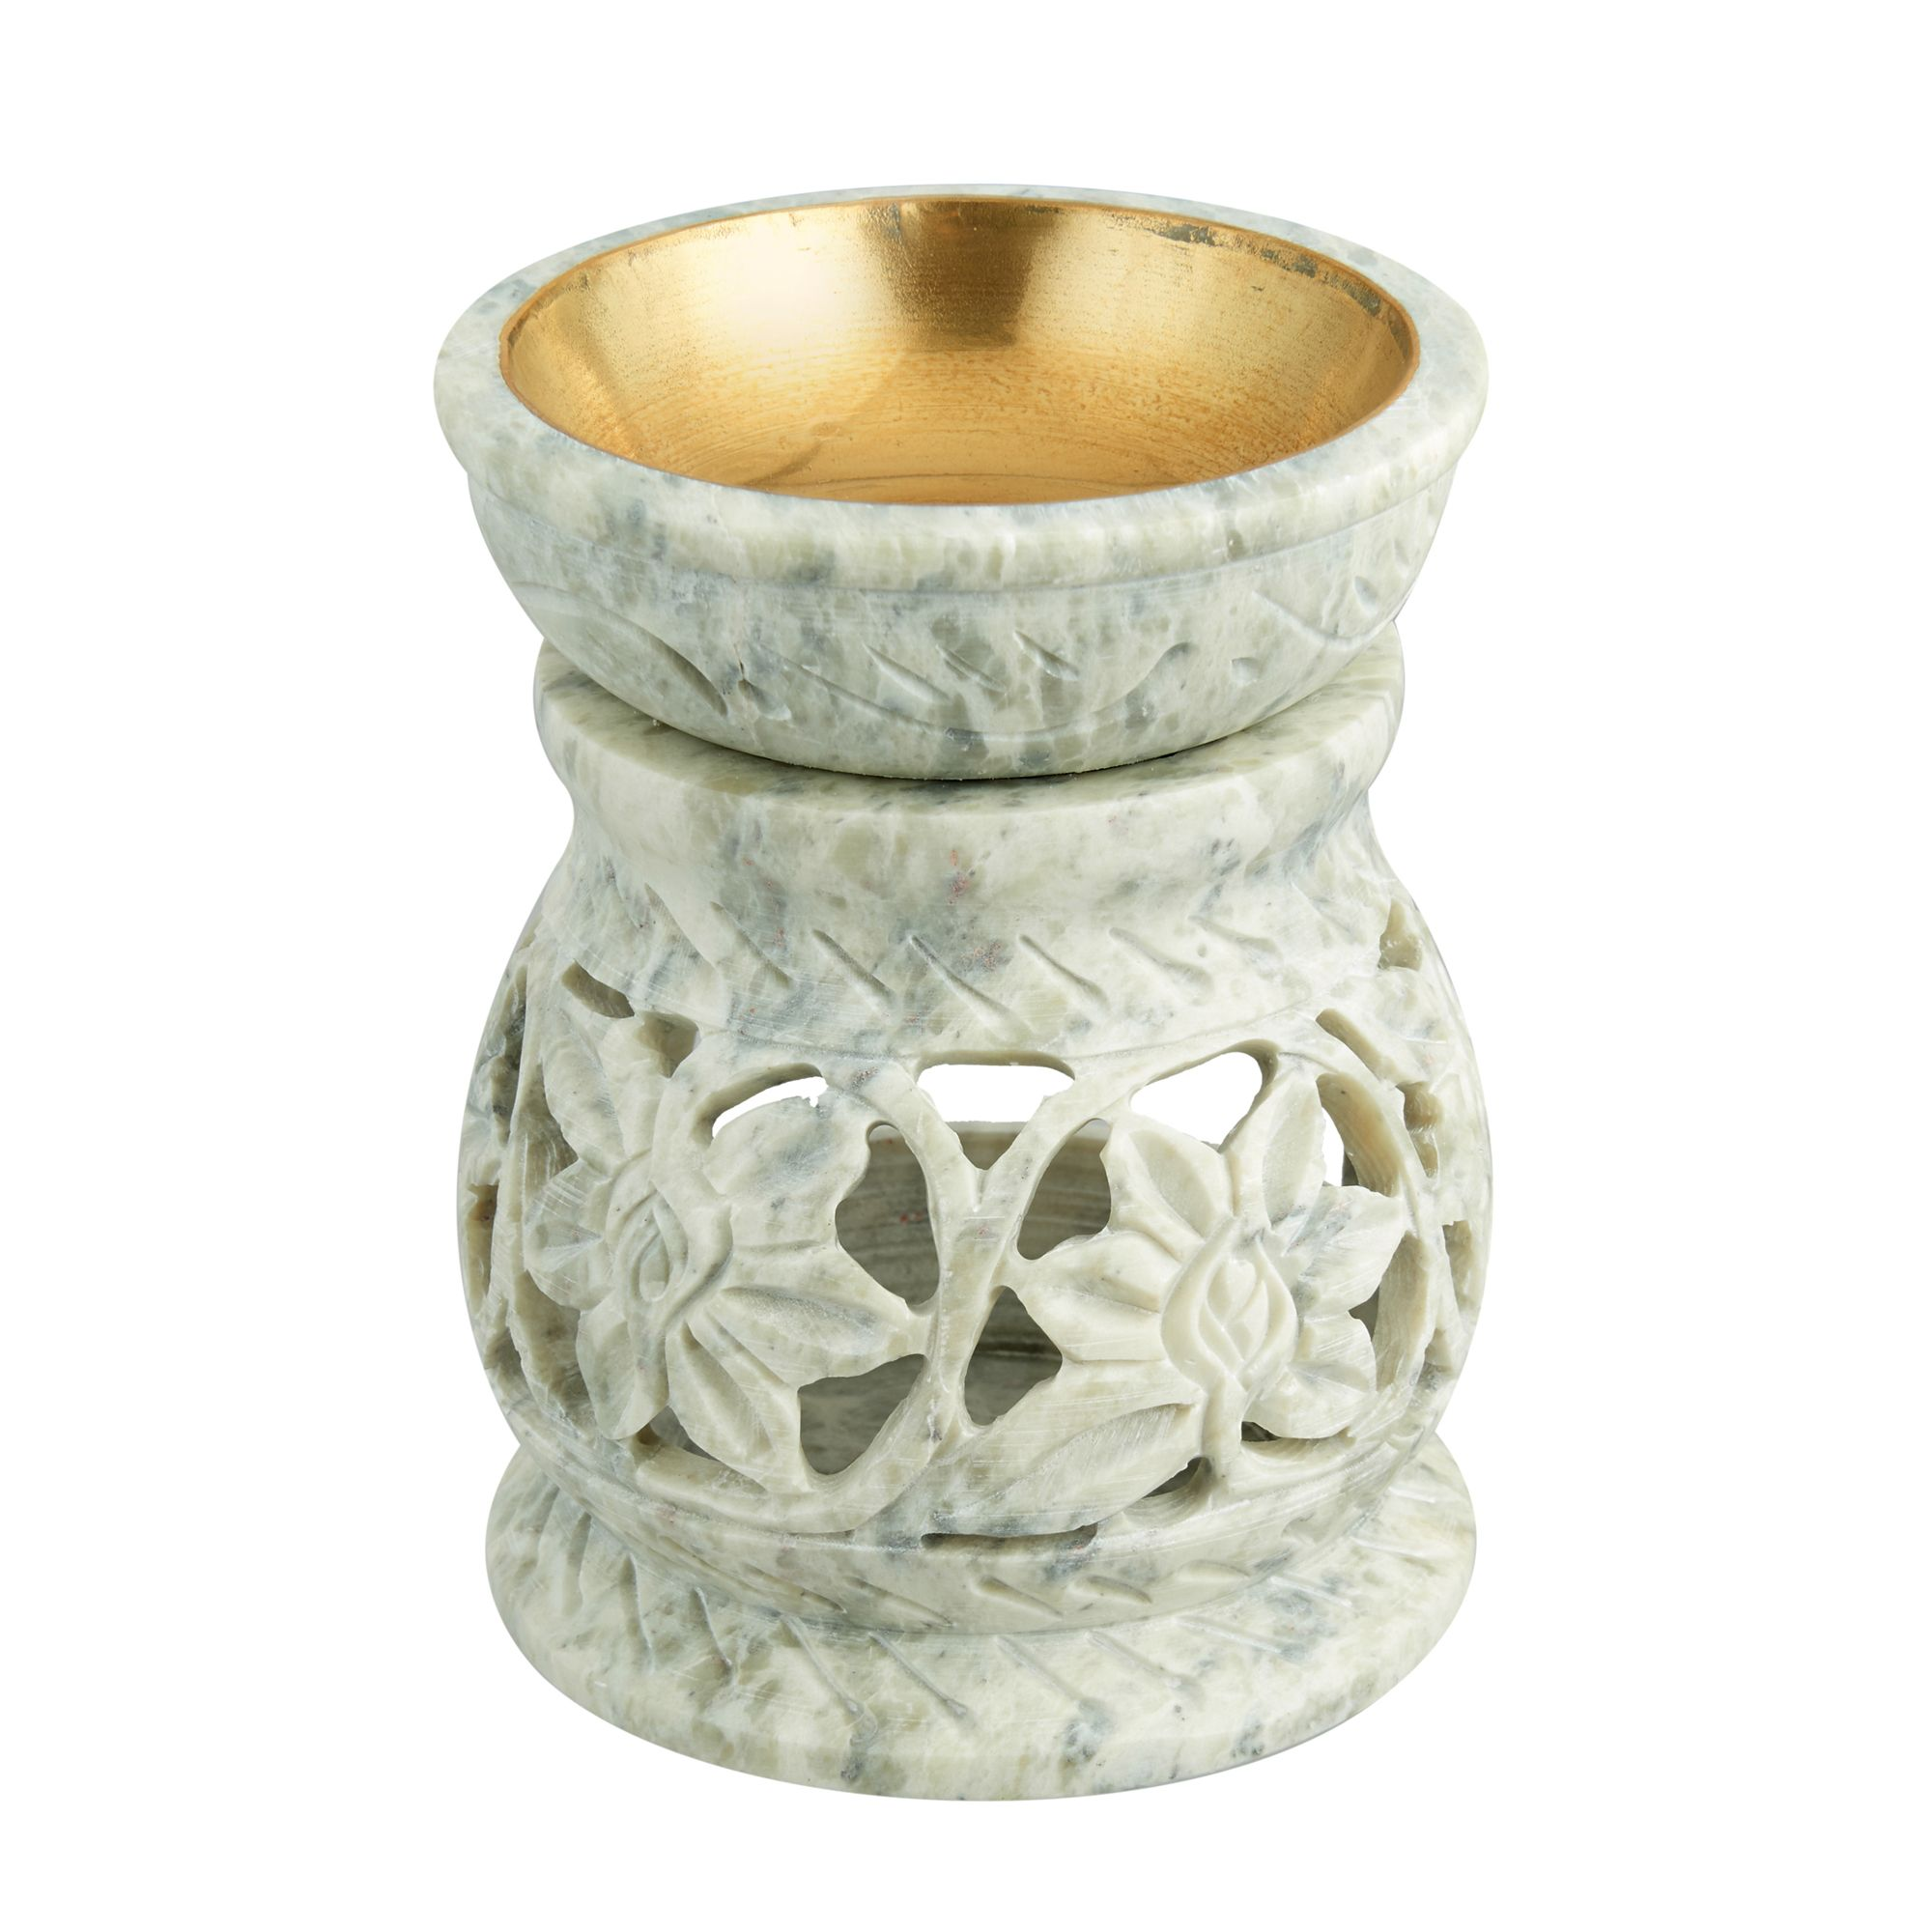 Stone Soapstone Oil Tart Warmer Spa Meditation Aromatherapy Tealight Modern Essential Oil Burner Oil Warmer Essential Oil Burner Tea Light Holder